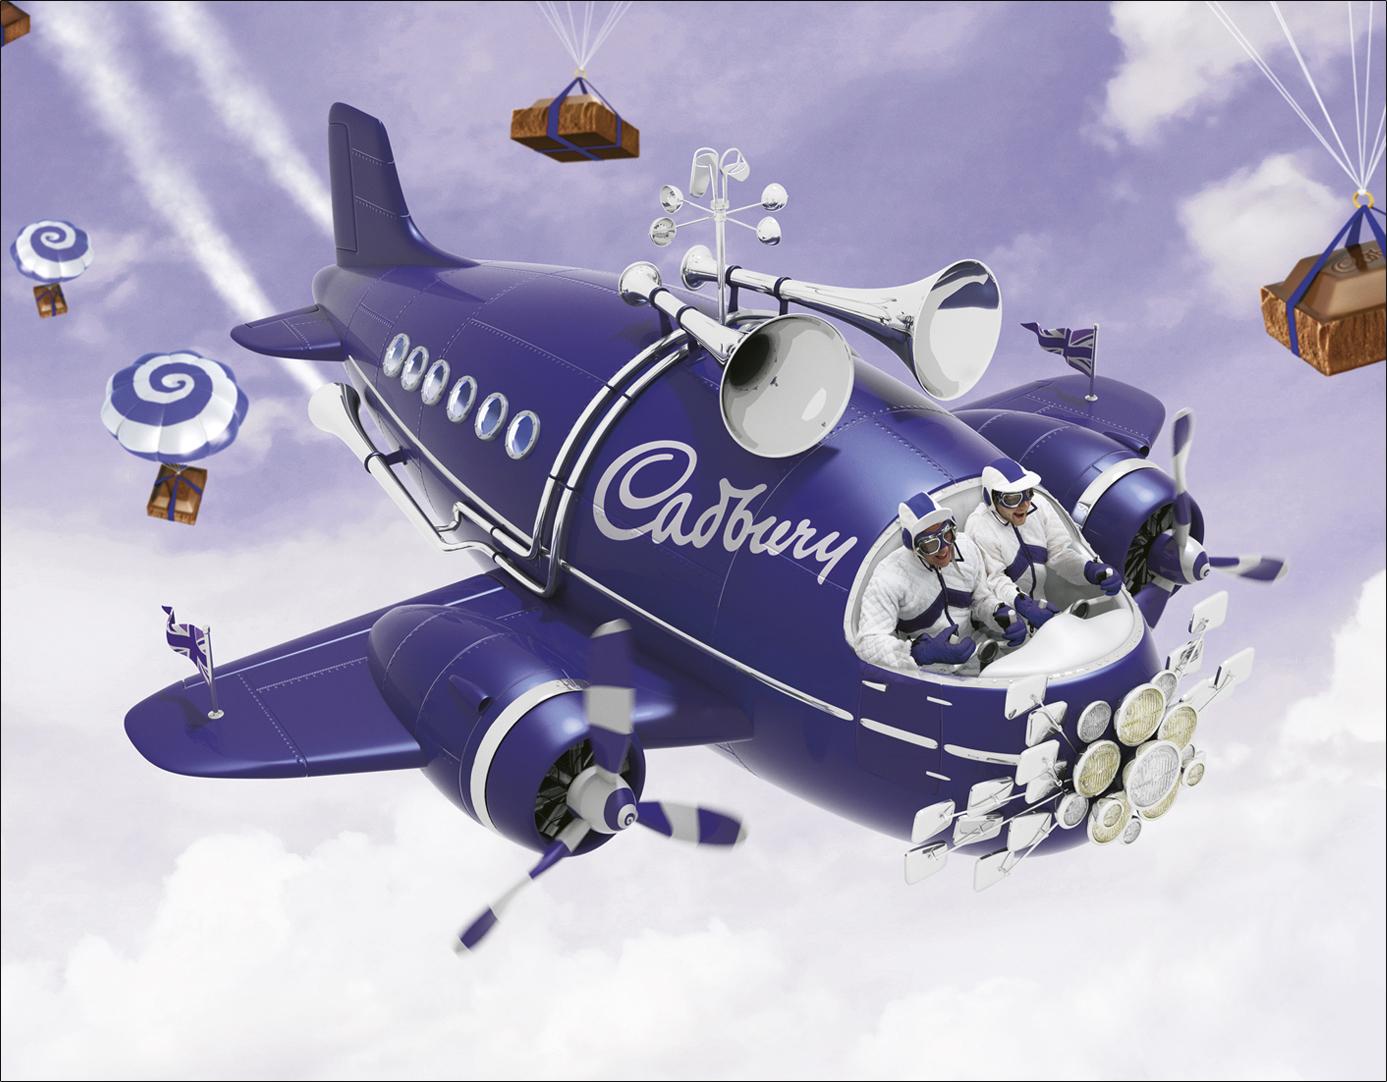 Cadburys1.jpg